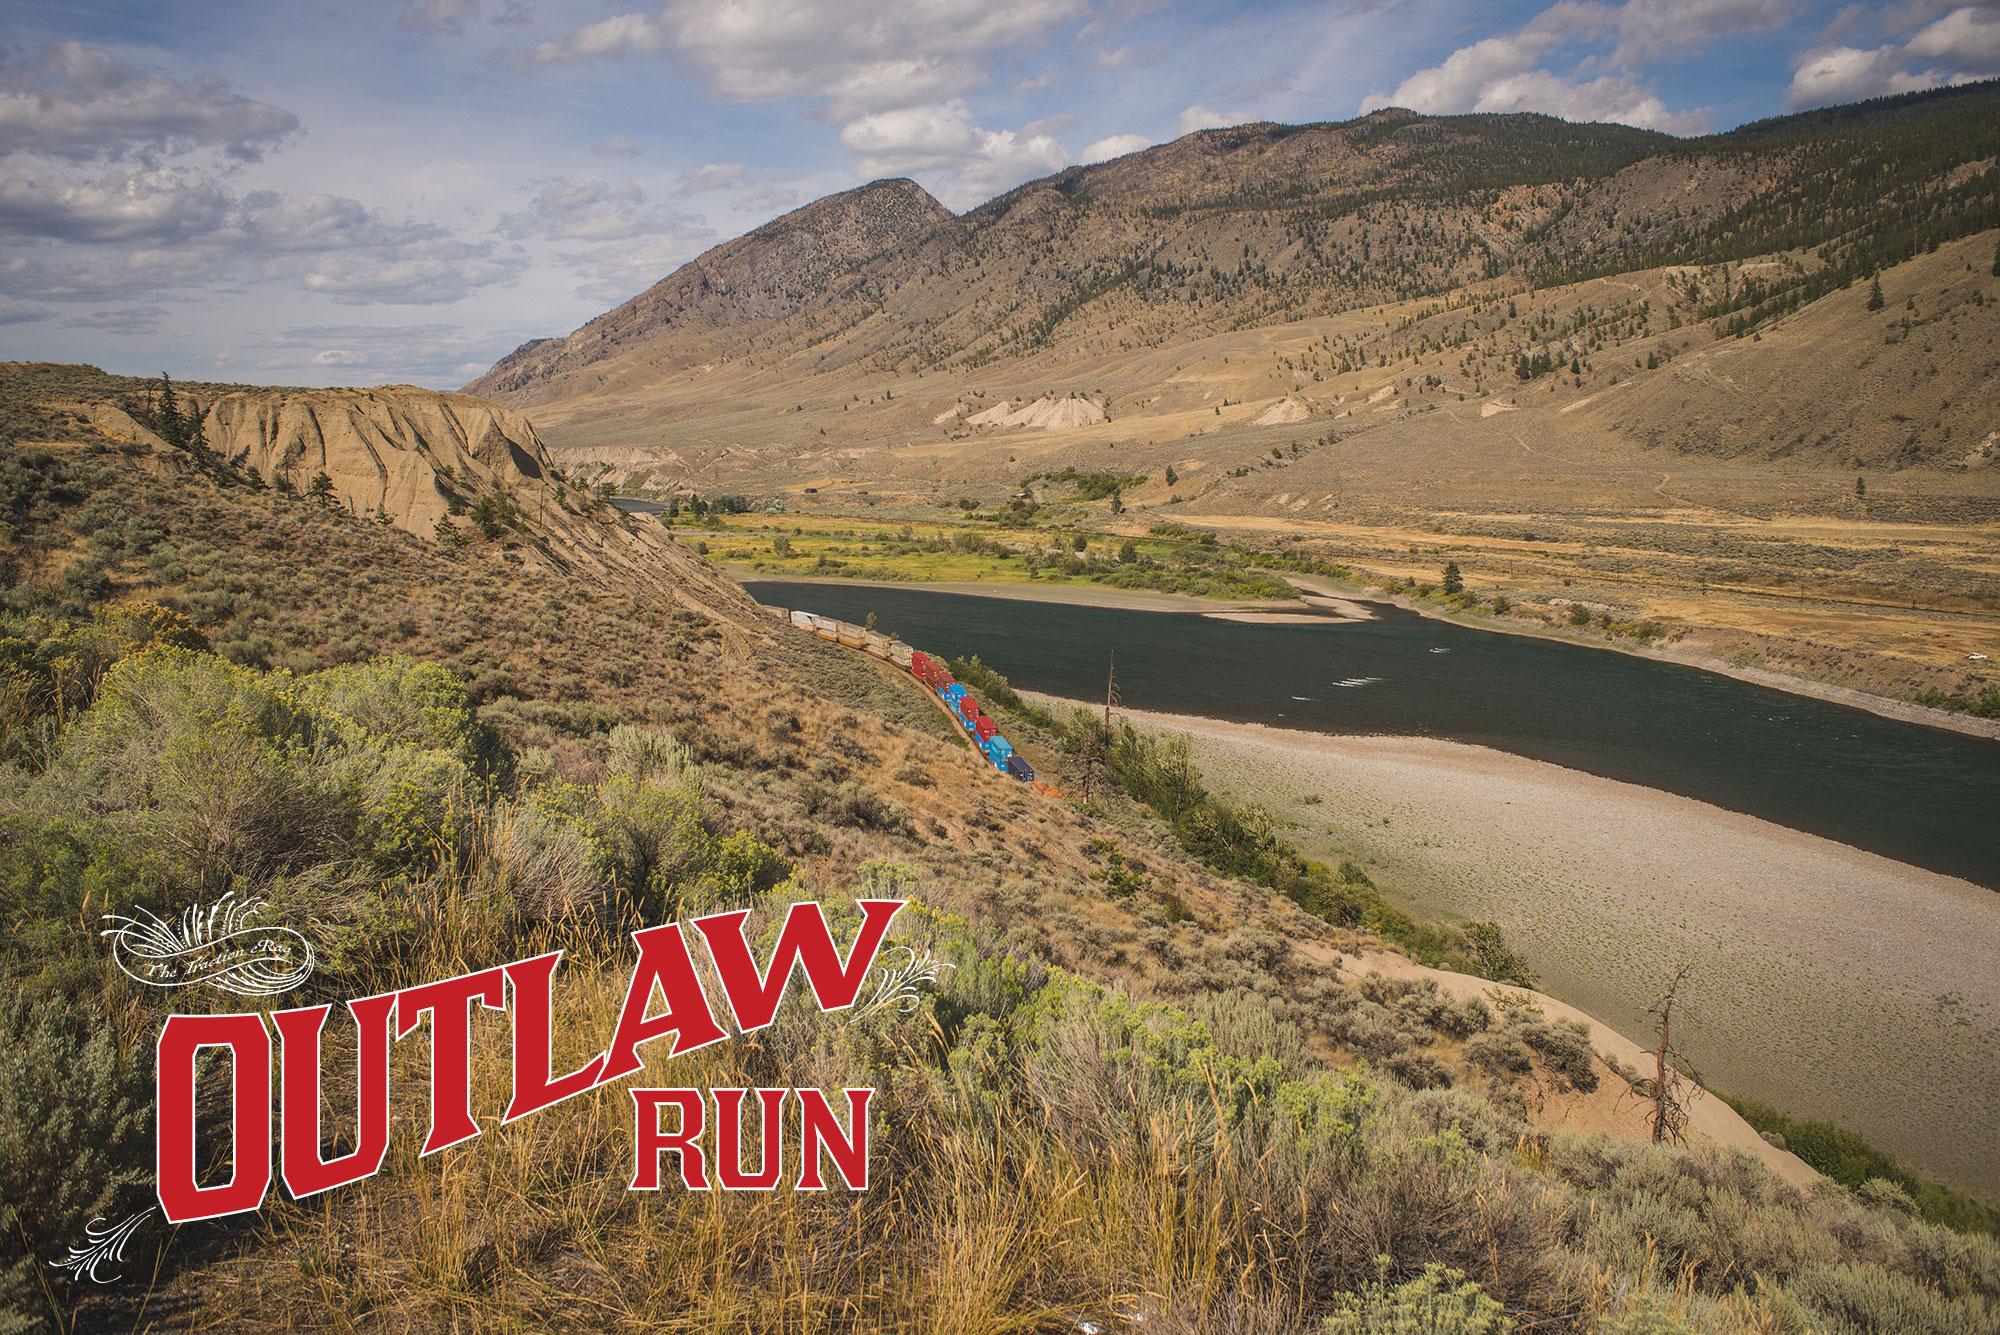 Outlaw-Run-train-canyon.jpg